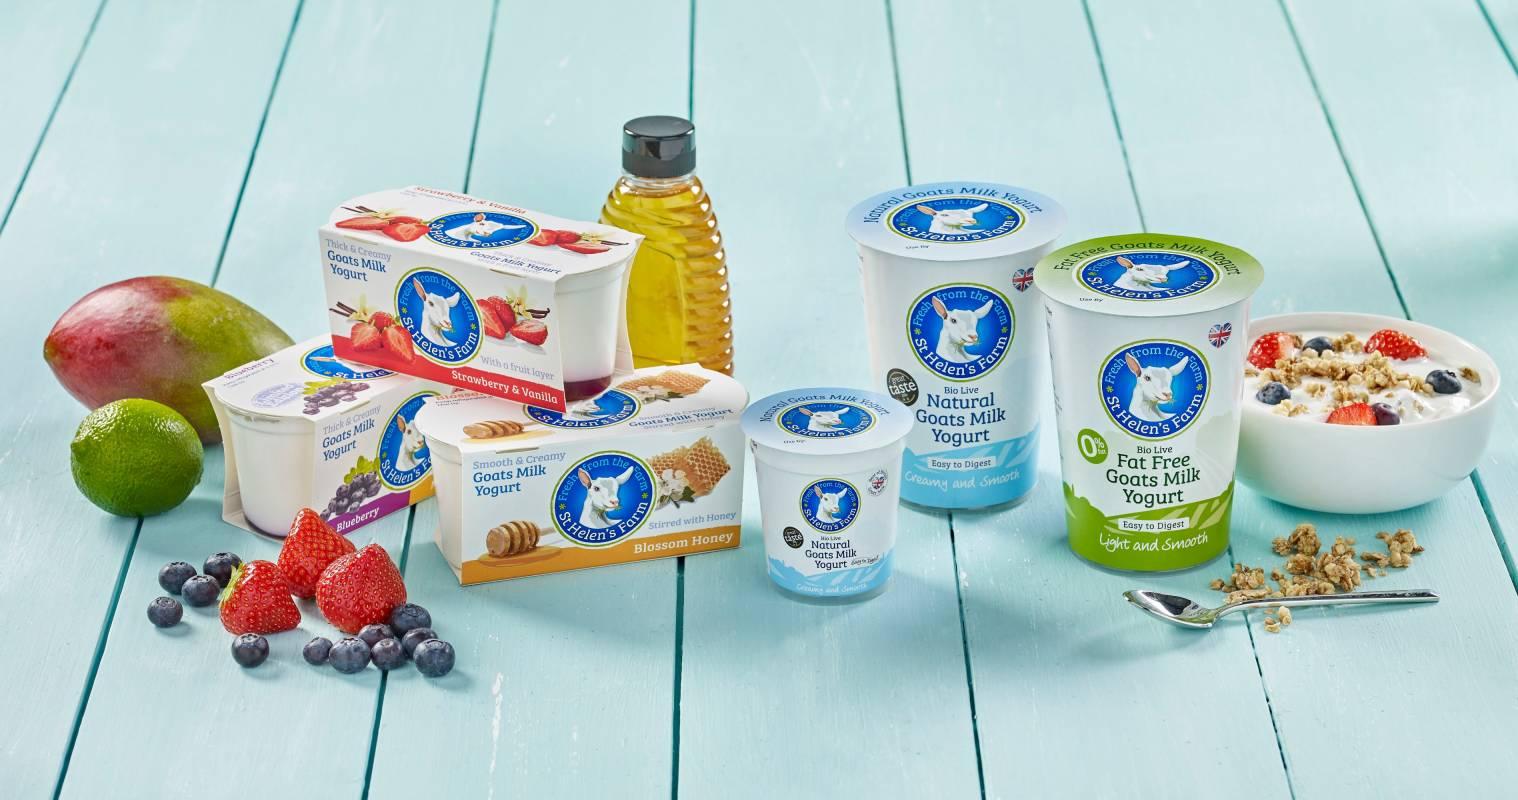 St Helen's Farm goats milk yogurt with fruit and honey